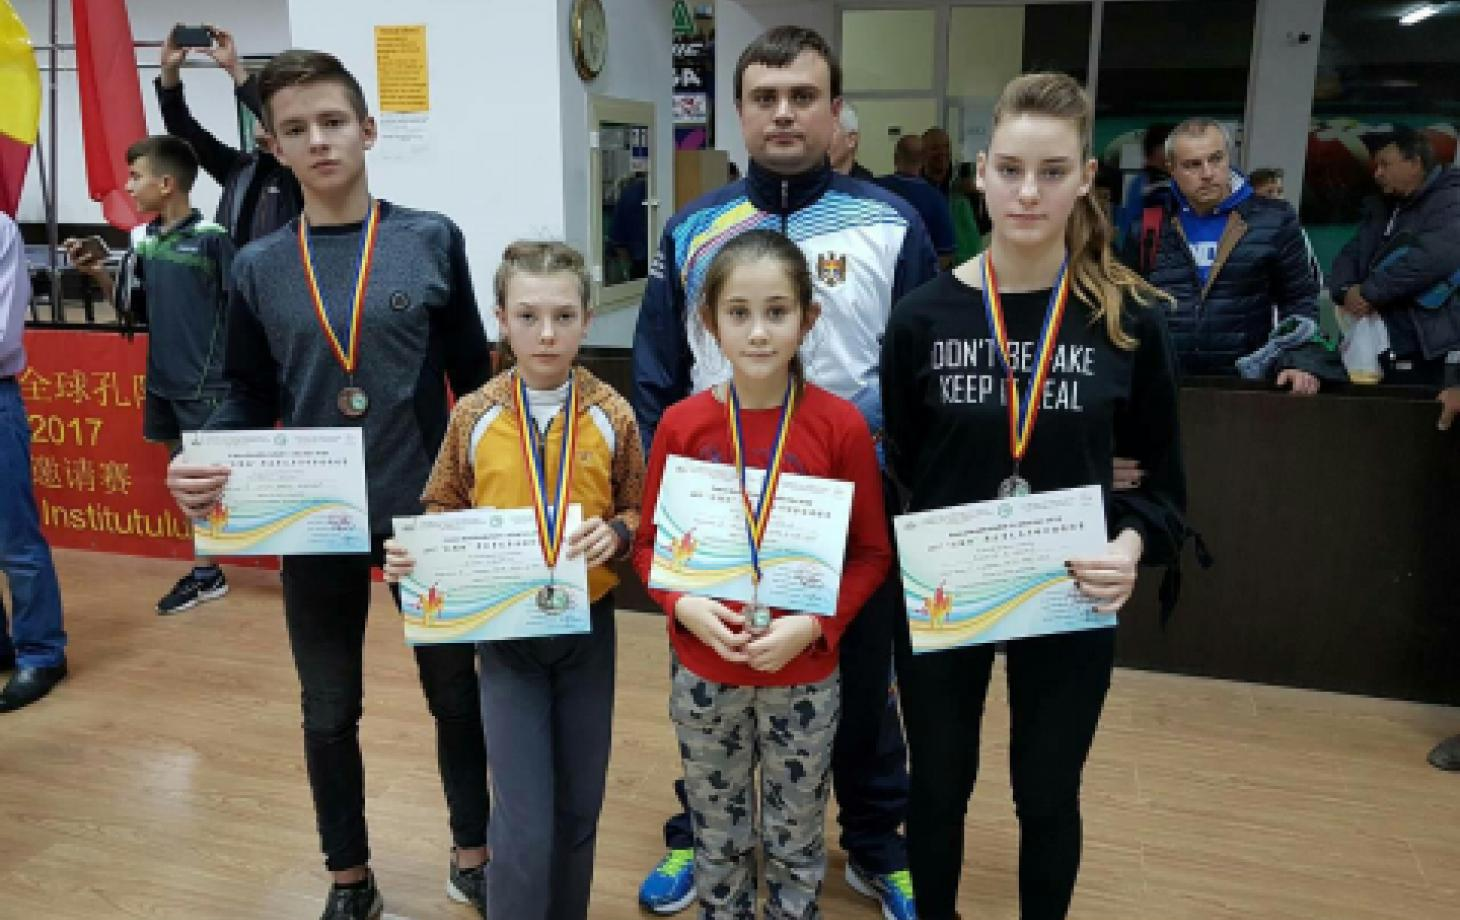 Команда теннисистов слева направо: Арсений Якубенко, Валерия Виеру, Виктория Михайлова, Виталина Брынза и тренер Олег Шарик